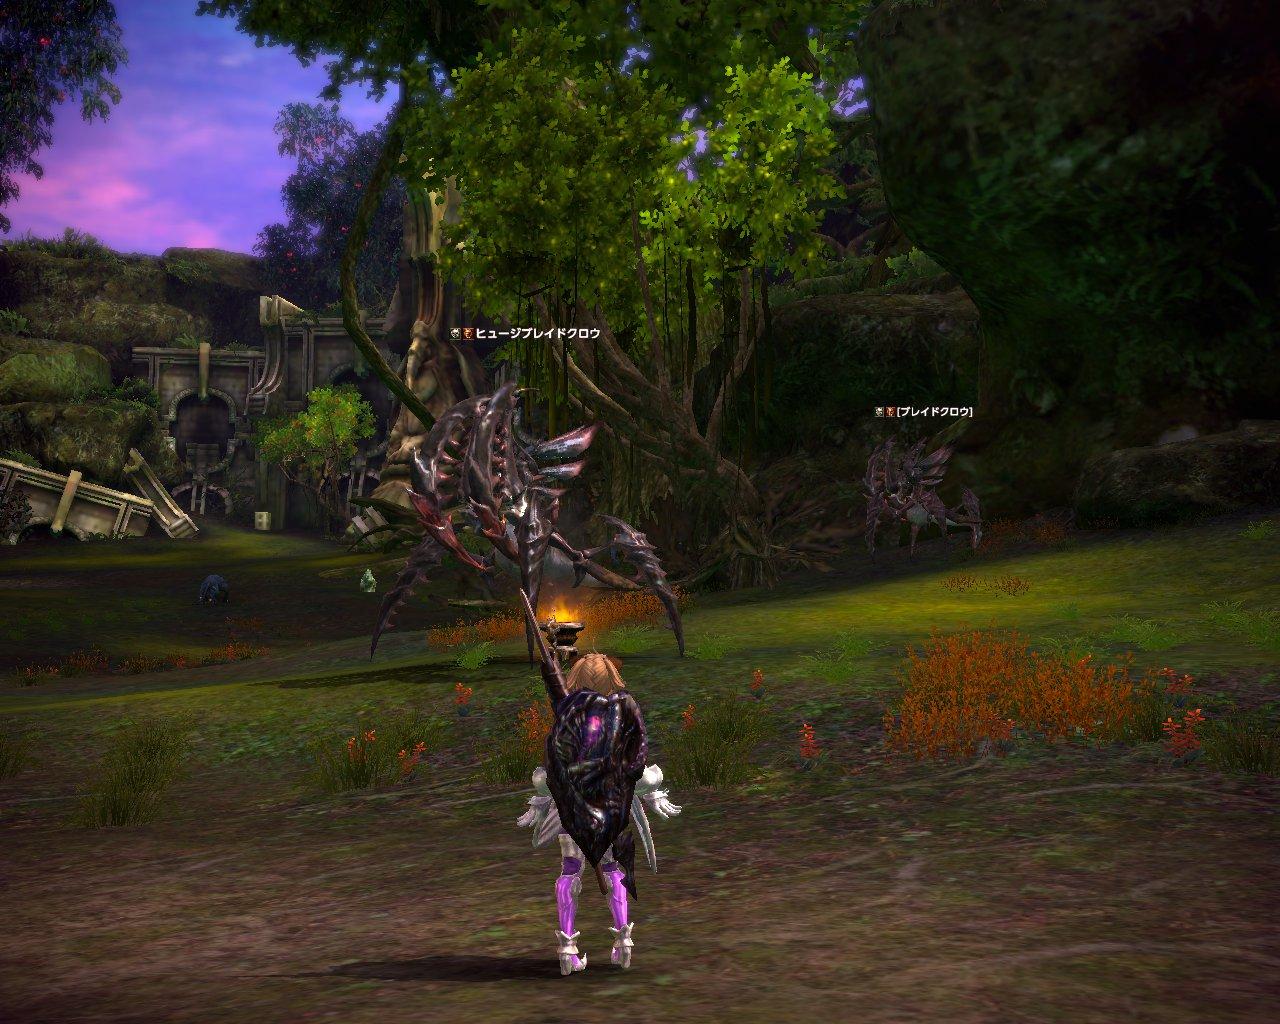 TERA_ScreenShot_20111121_230122.jpg